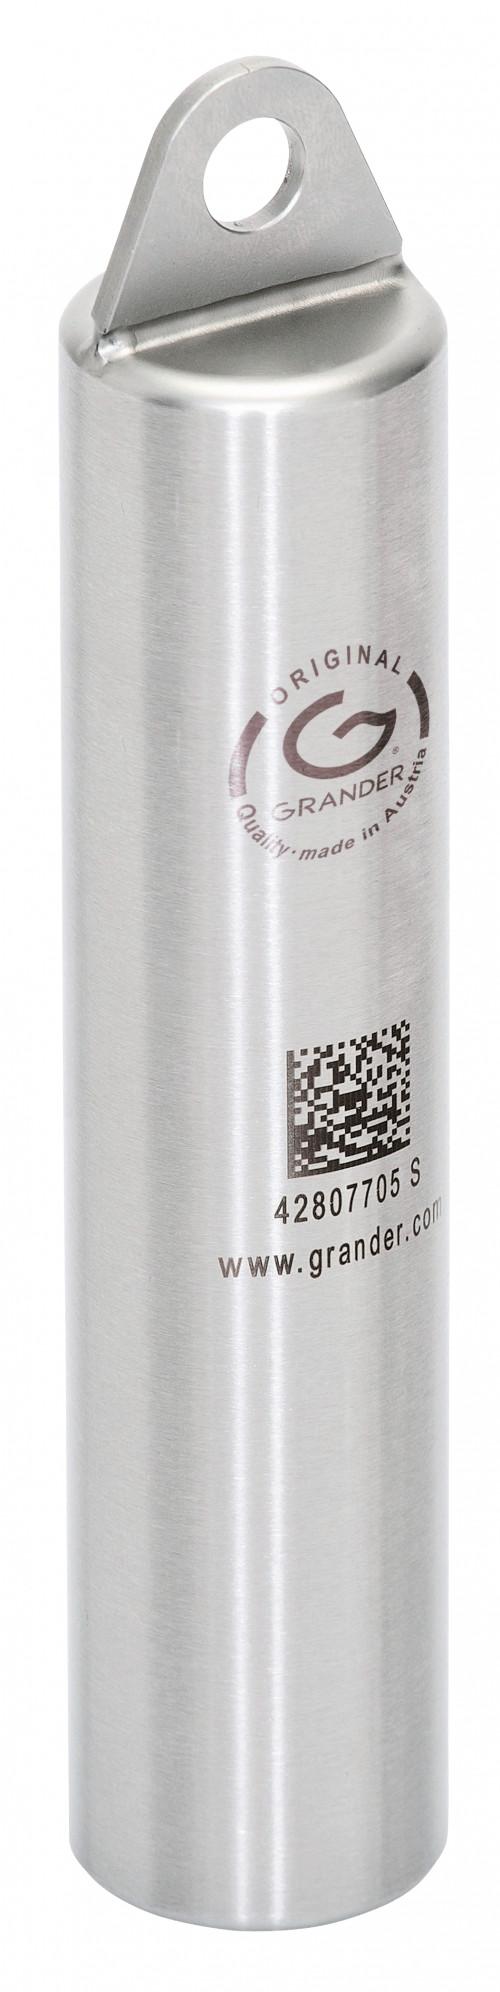 GRANDER®-Belebungsstab klein